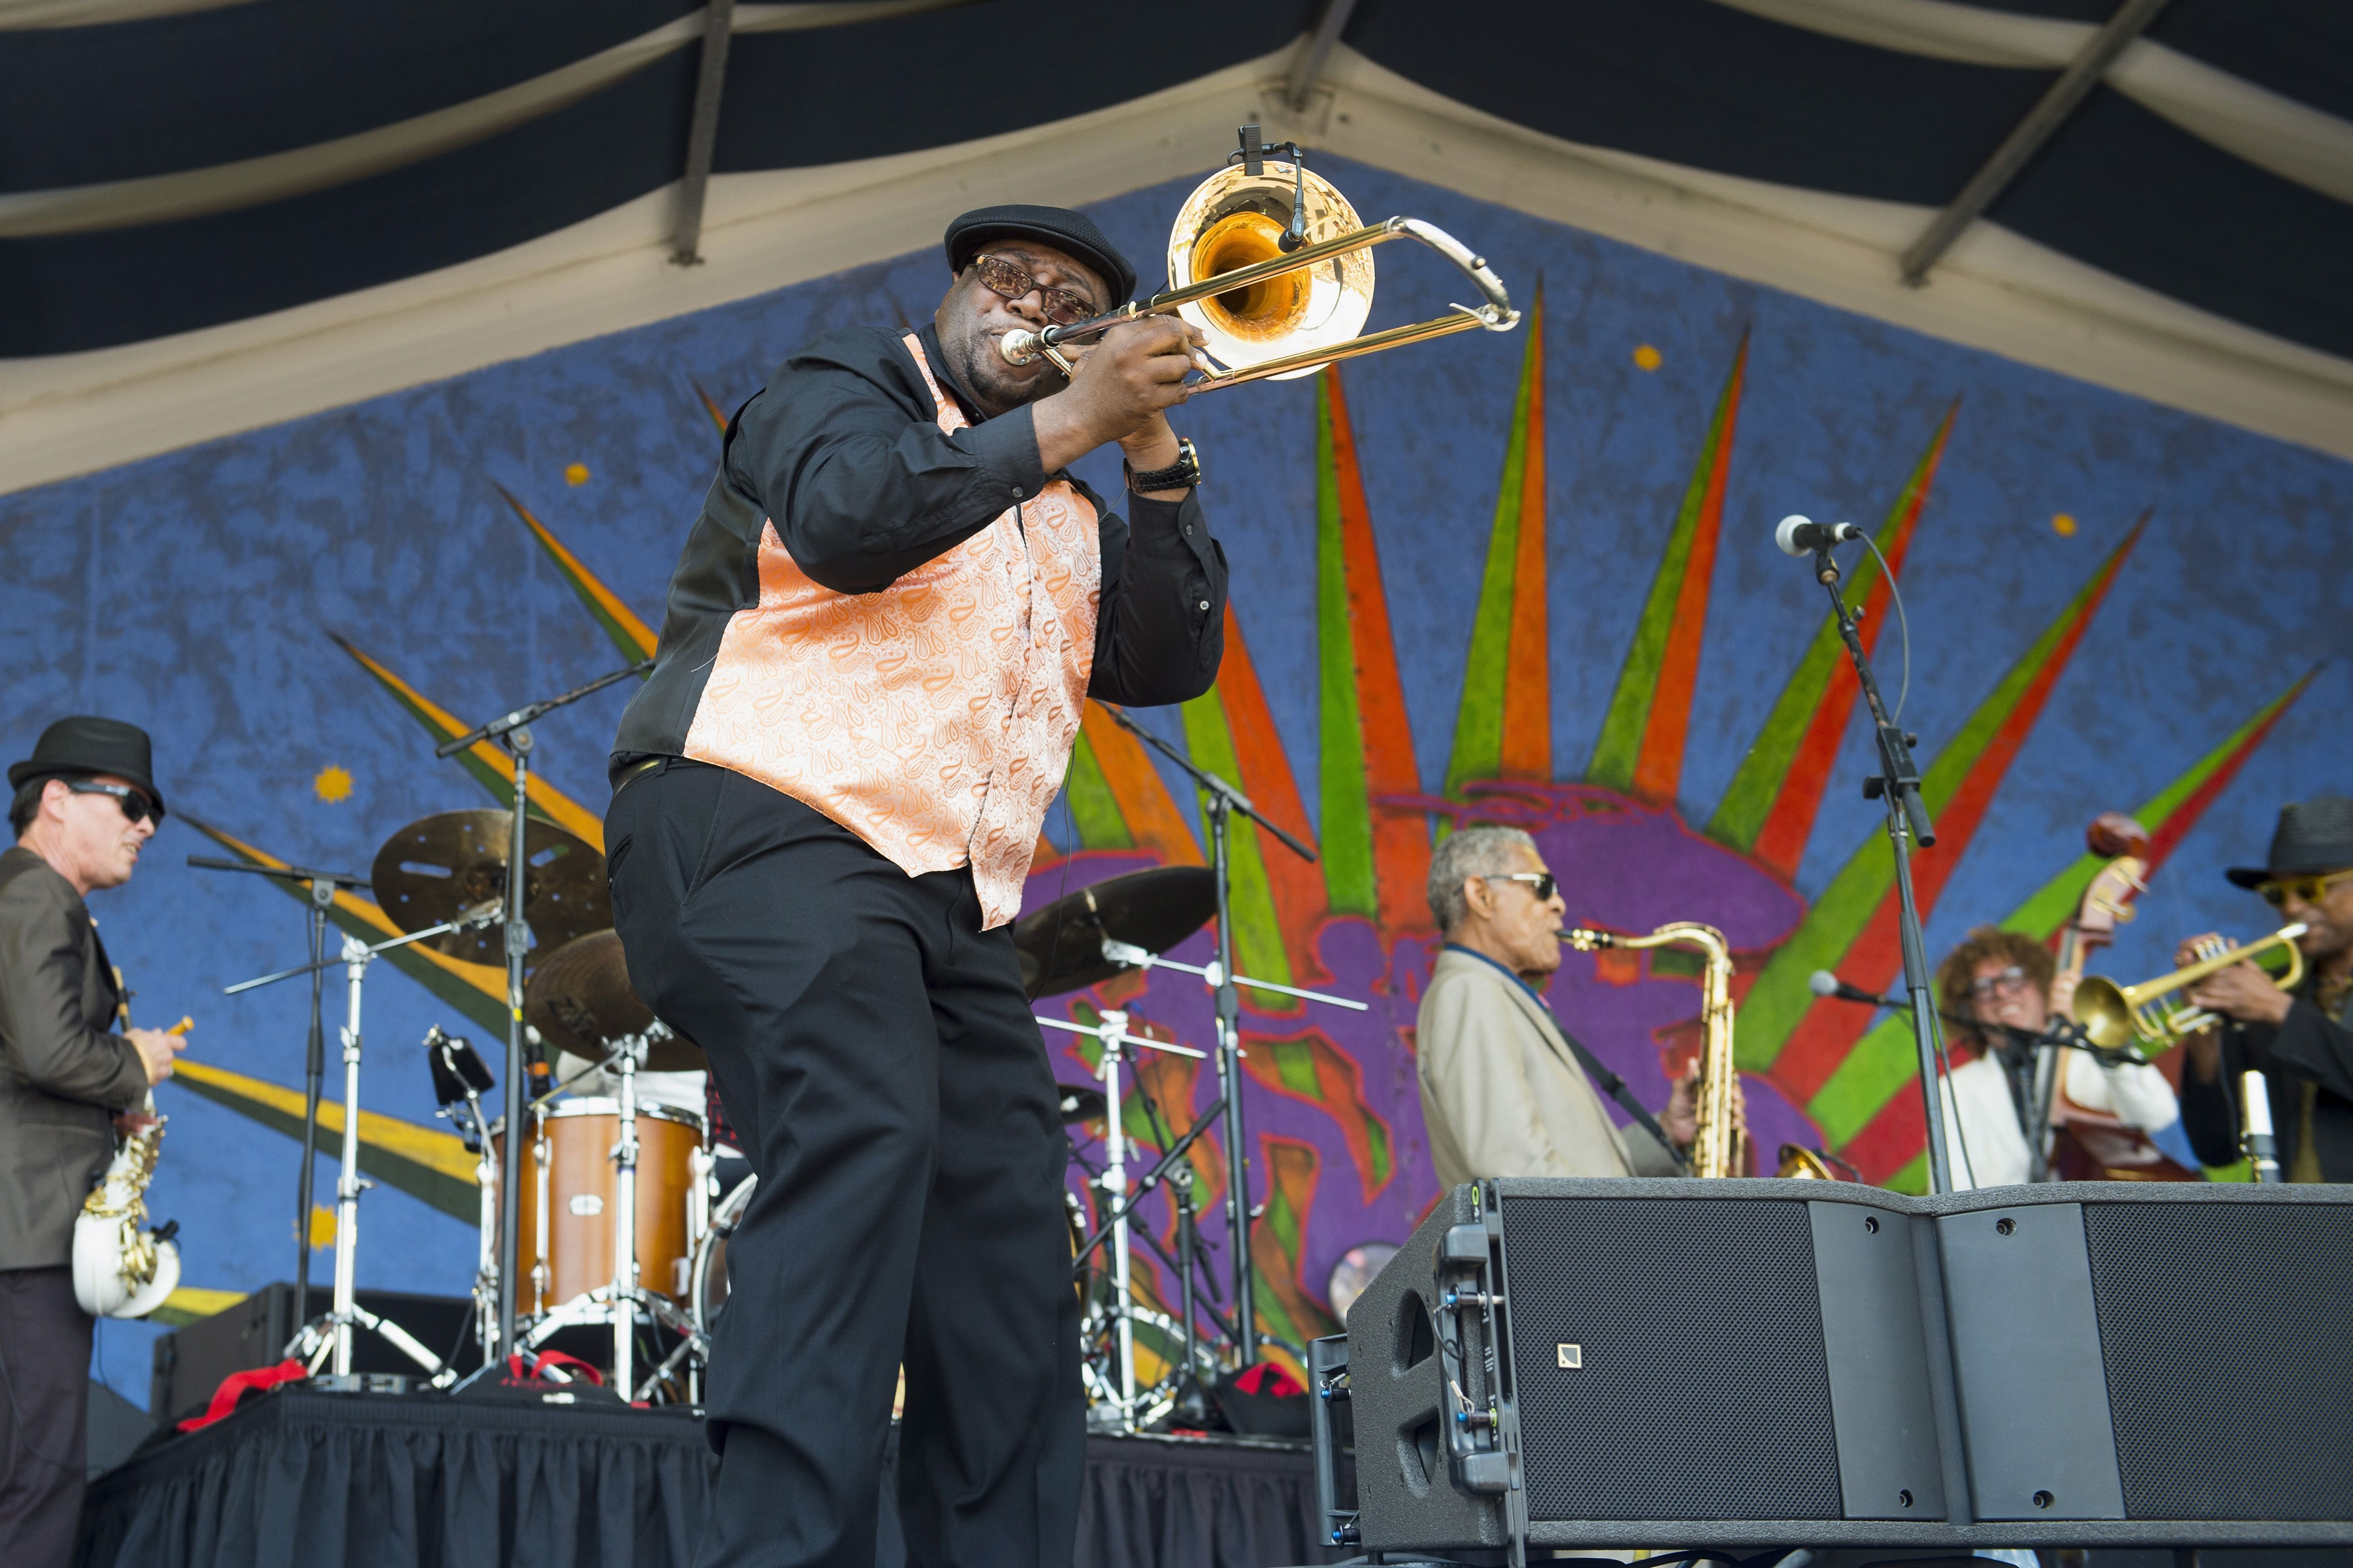 Trombone player at New Orleans Jazz Fest